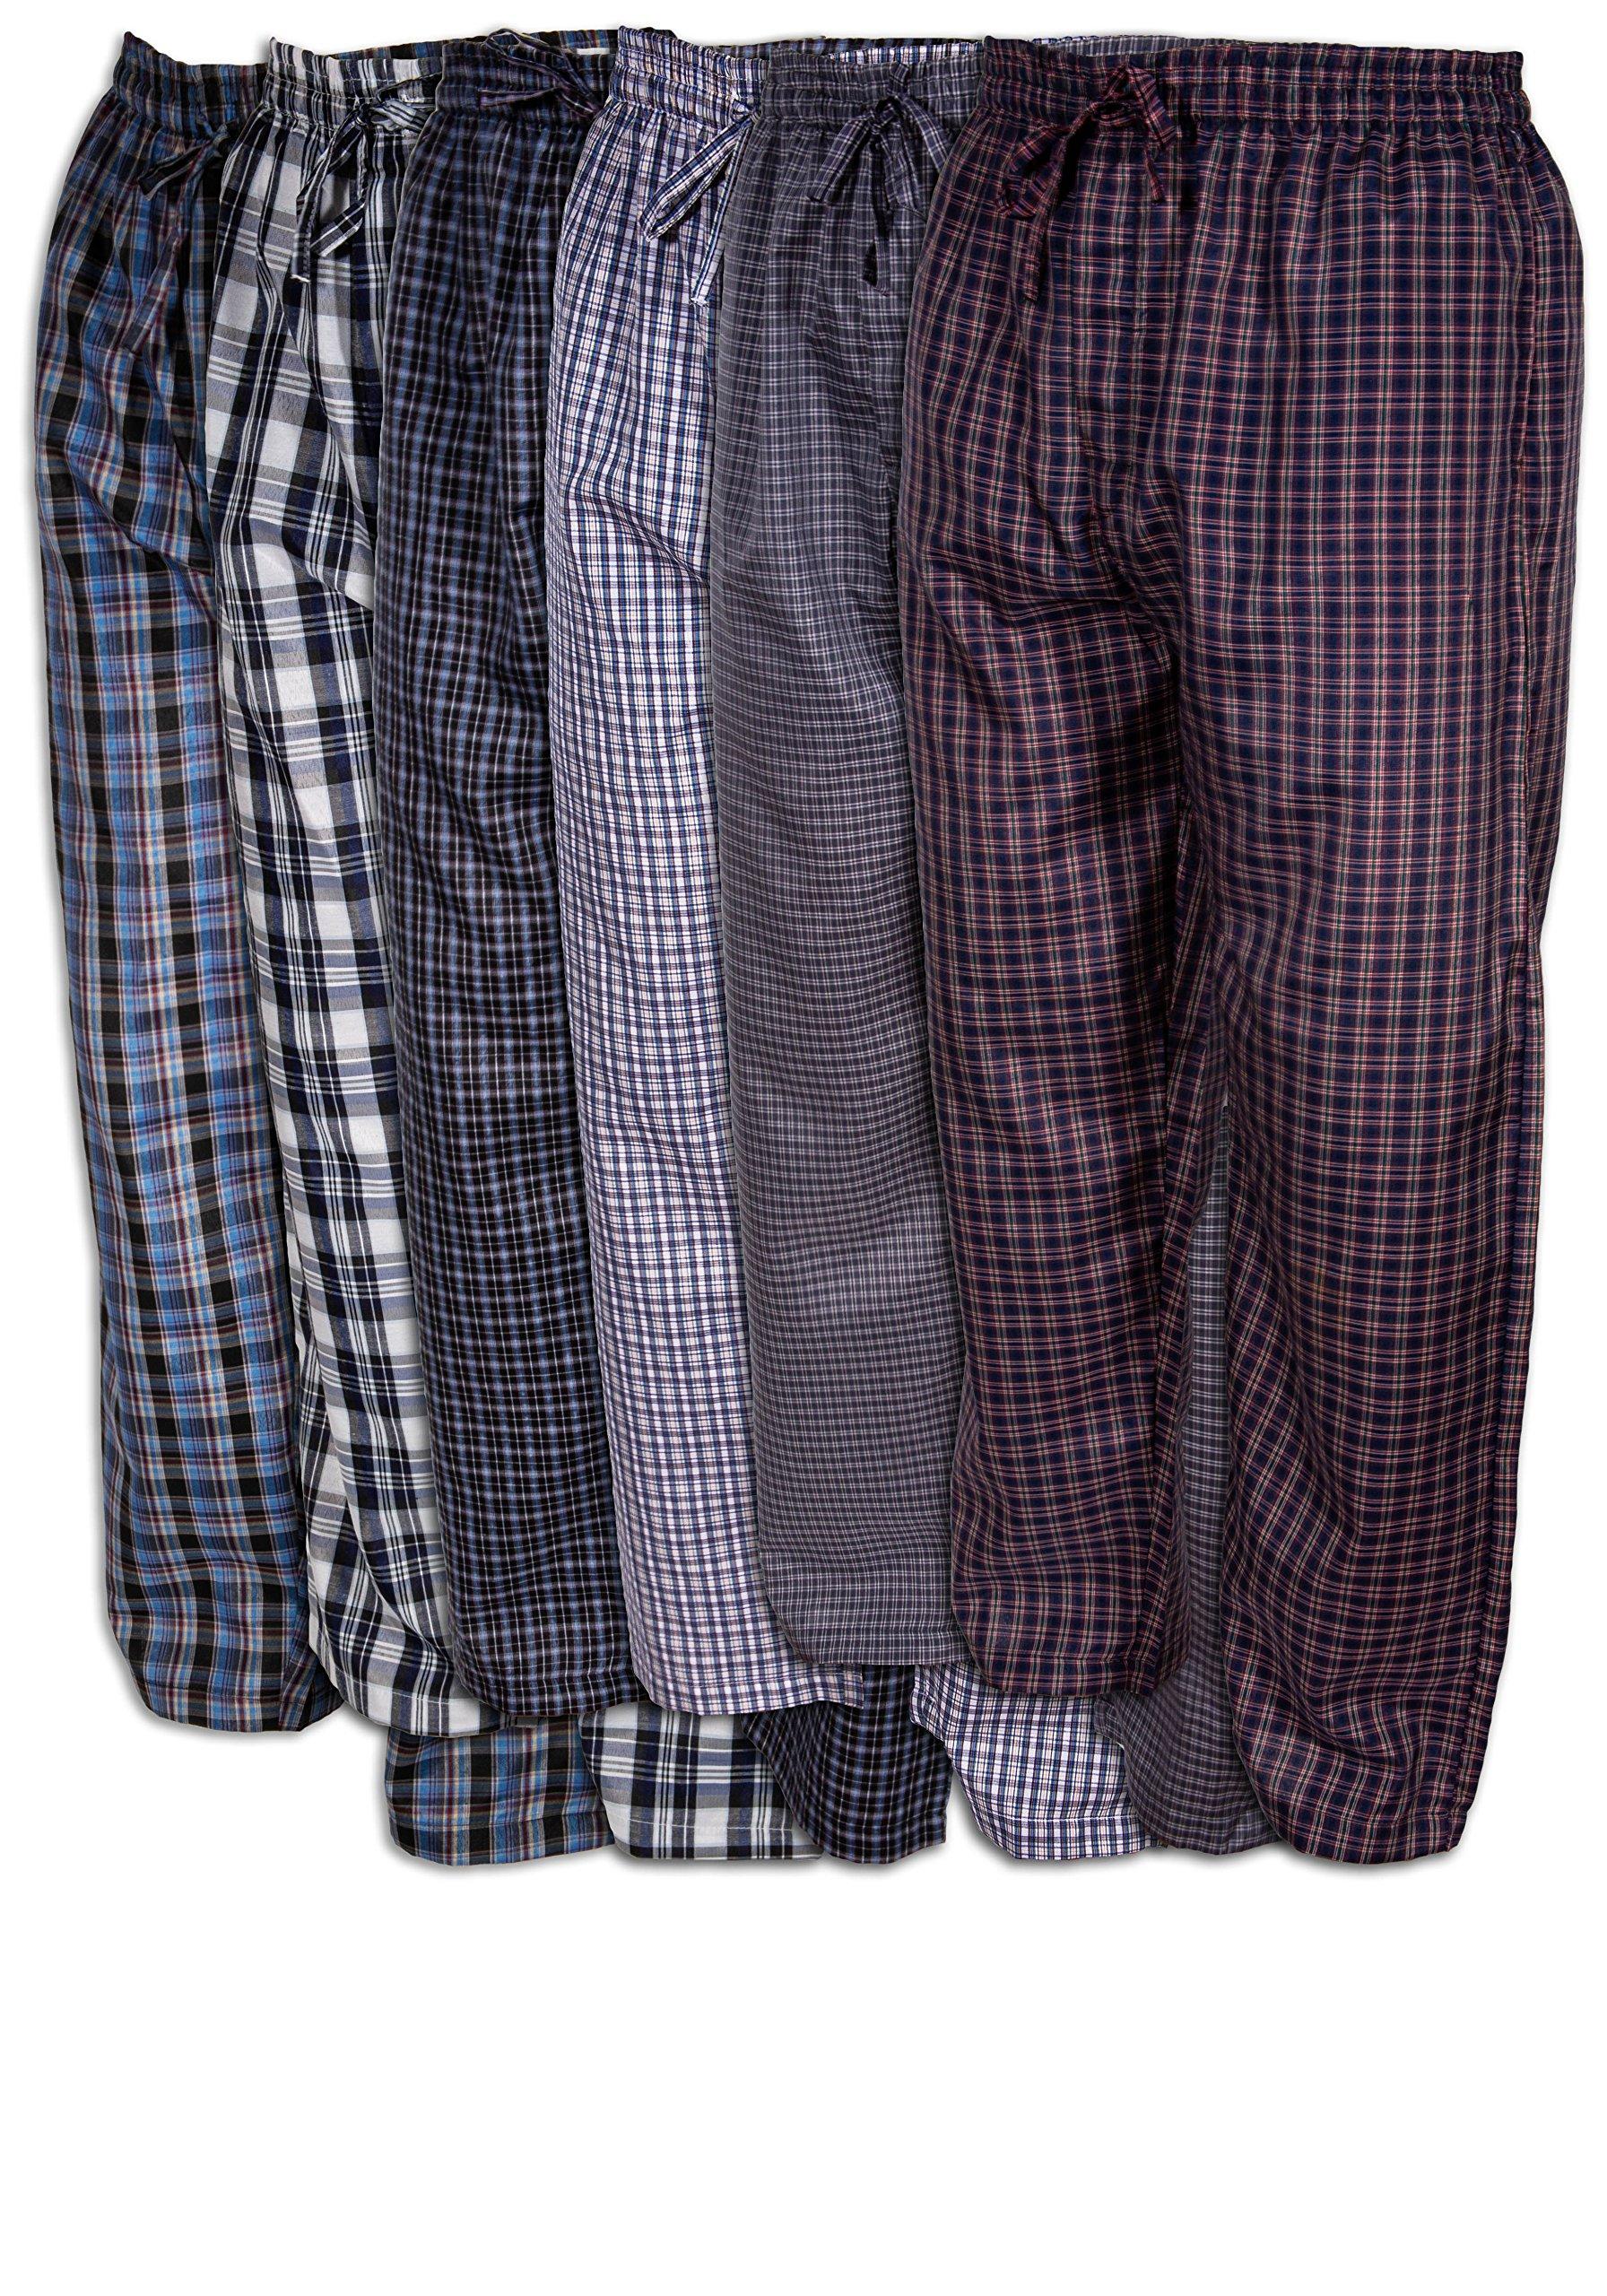 Basics Men's 6 Pack Woven Drawstring Thin - Lightweight Sleep & Lounge Pants (XL 40-42, 6 Pack - Assorted Classic Plaids)